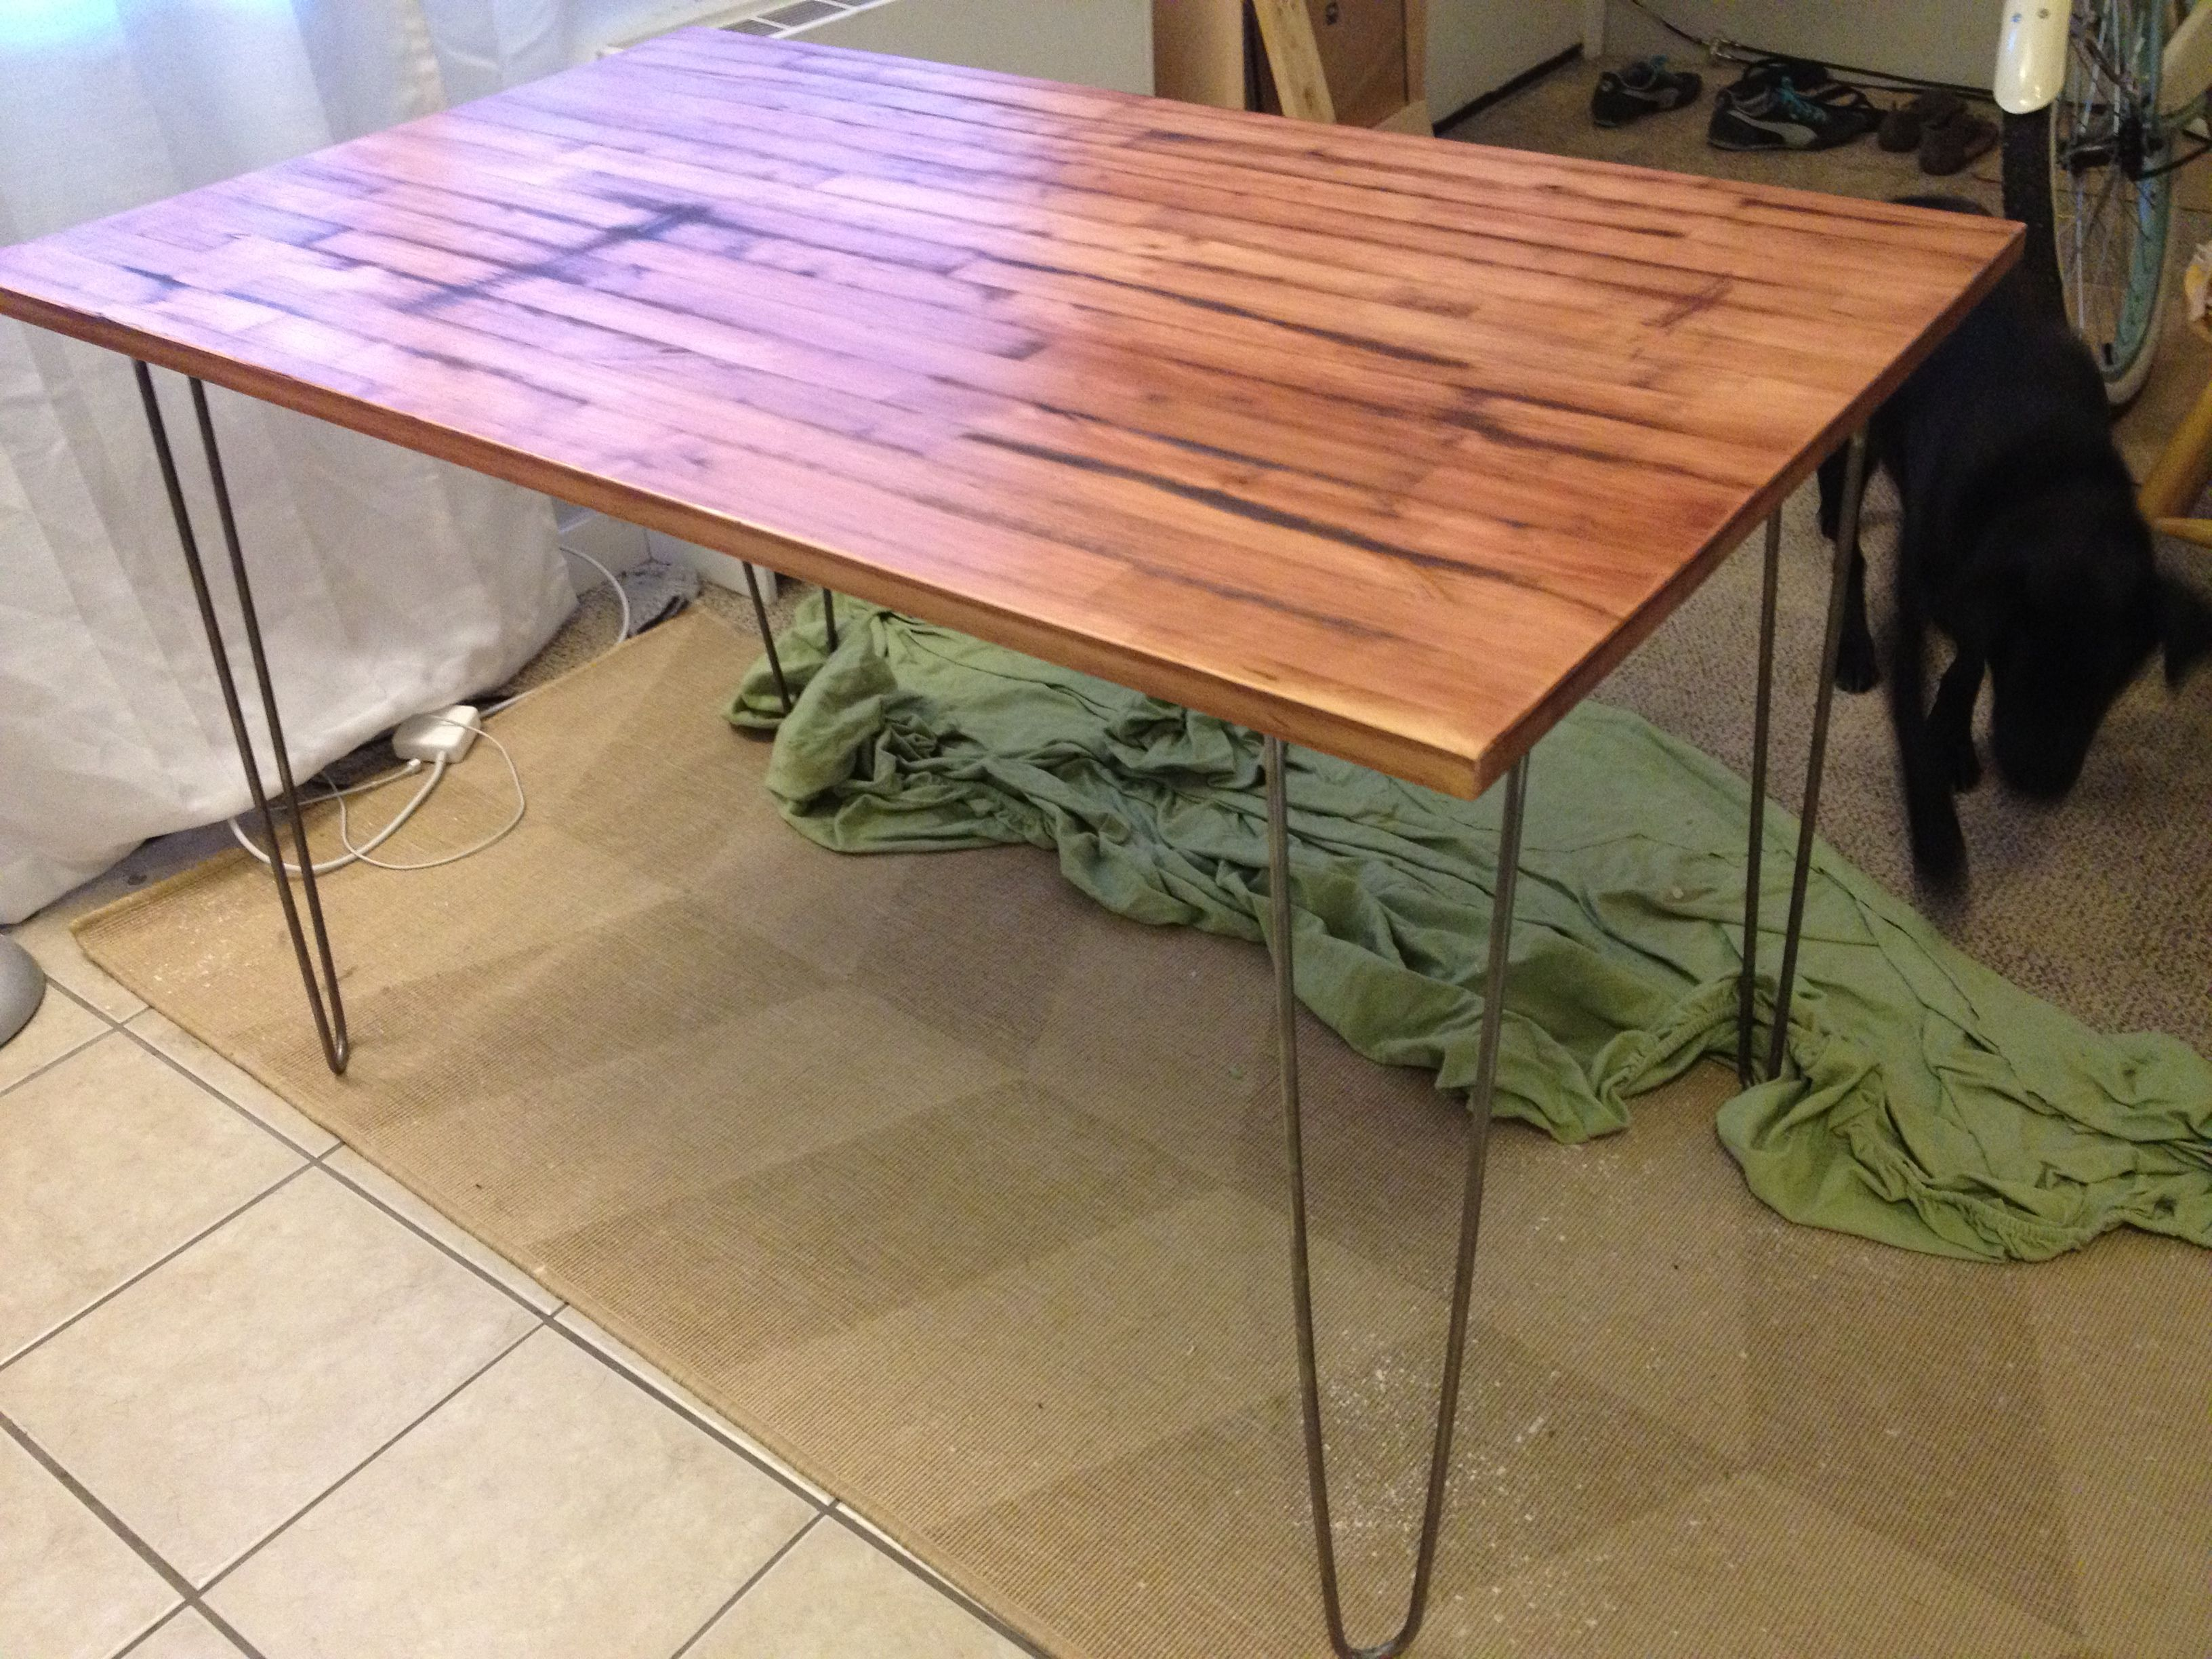 Gerton Table Top Ikea Hack Google Search Hairpin Leg Dining Table Ikea Dining Chair Hairpin Leg Coffee Table